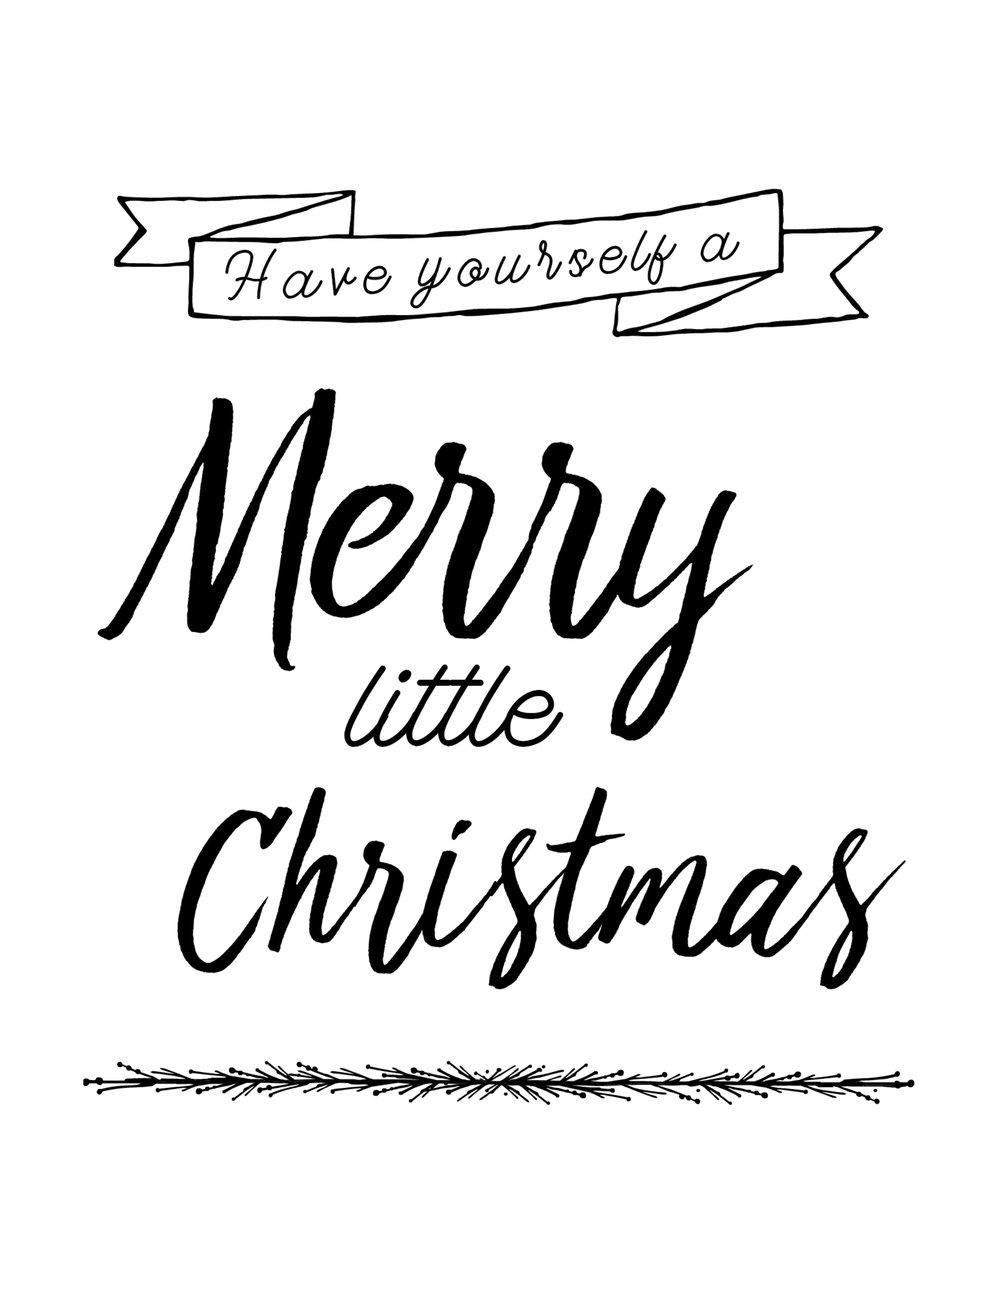 Have Yourself A Merry Little Christmas Printable Card Design GOOD LIFE PRINTABLE